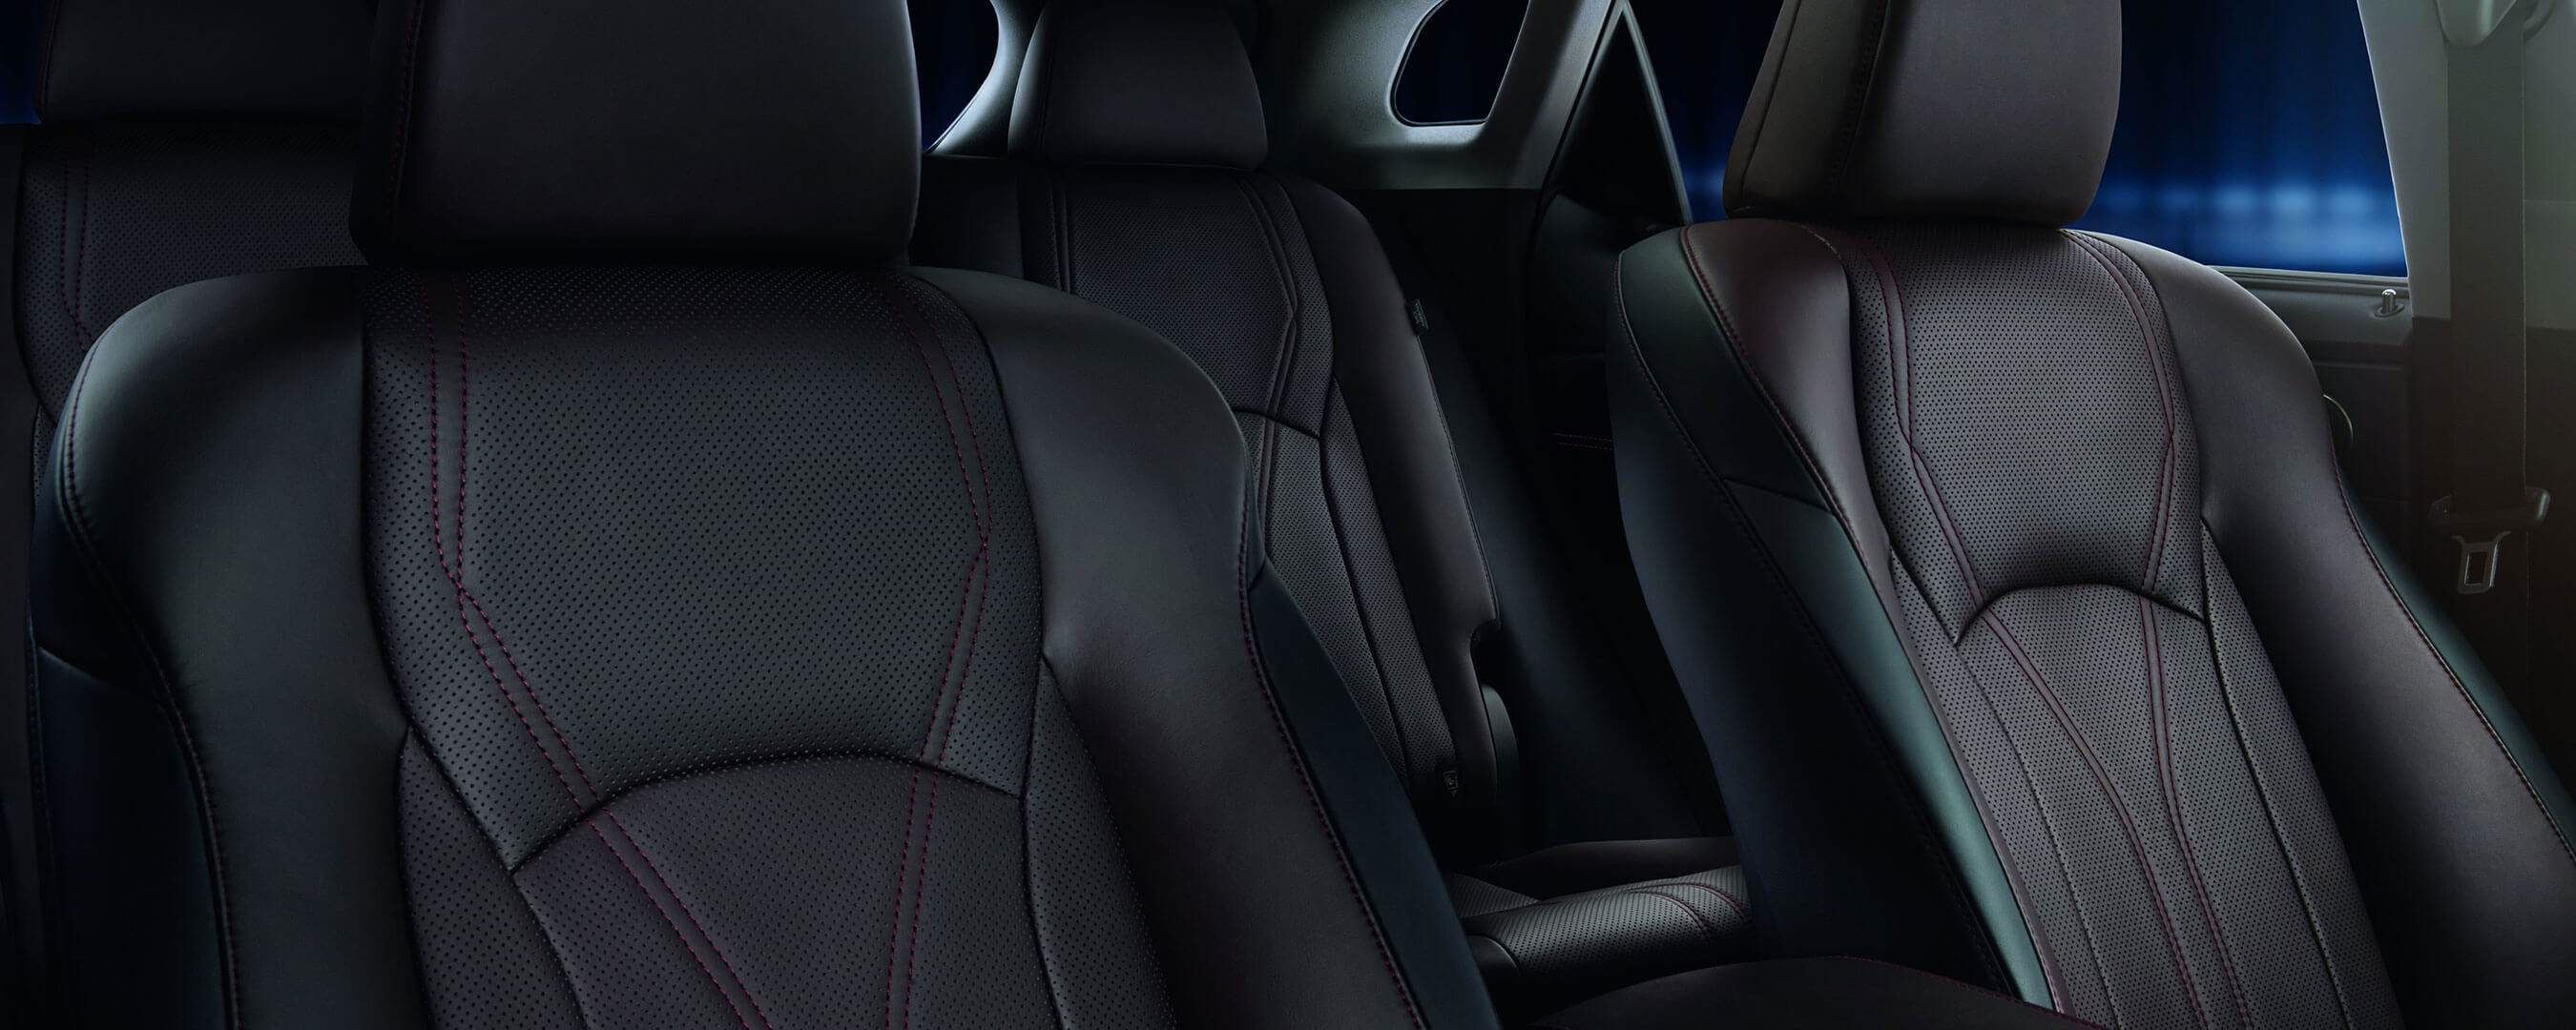 2017 lexus rx 450h experience hero interior back